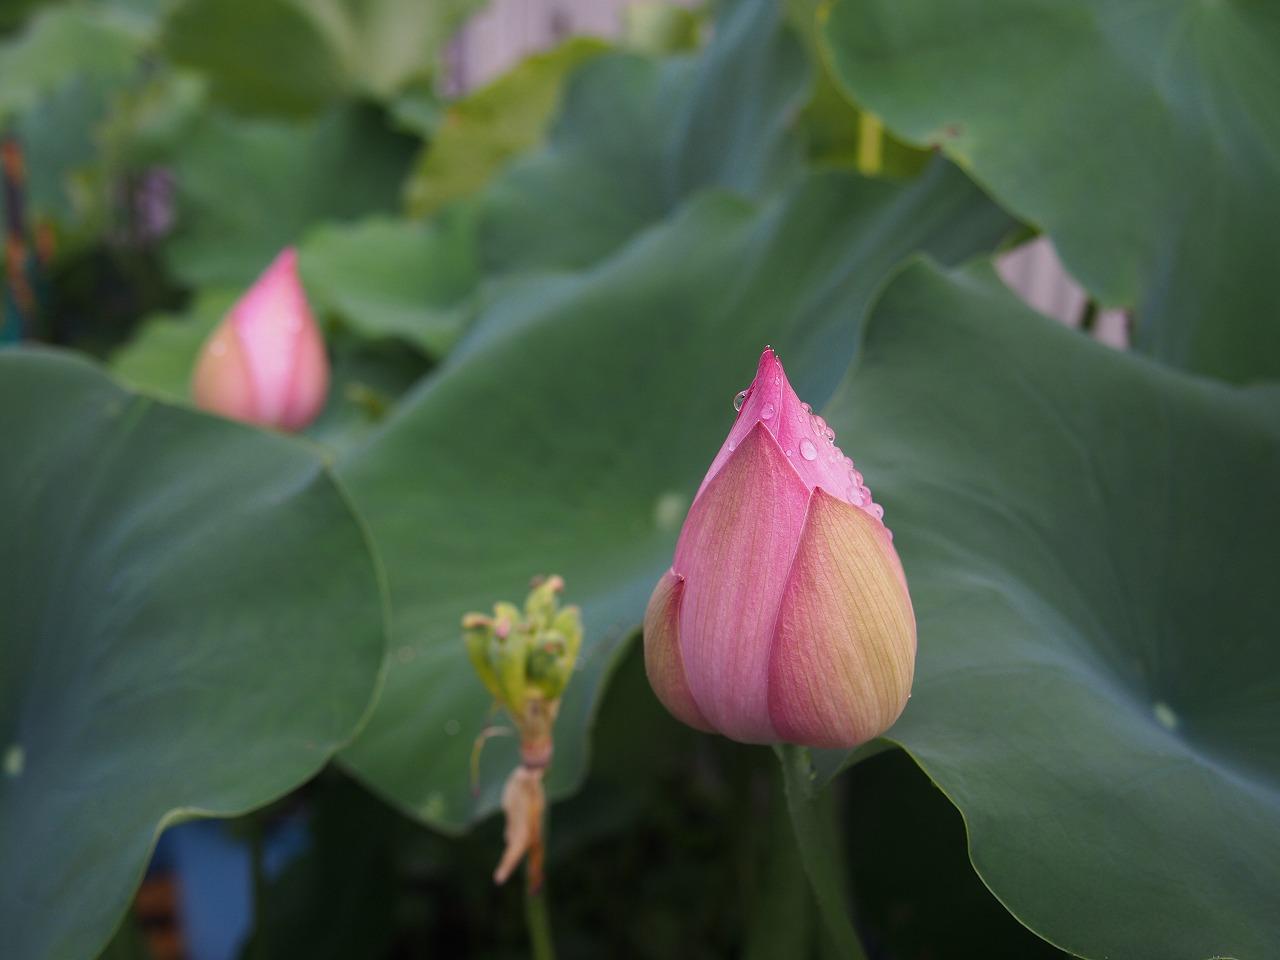 20170726-Lotus_Hishinkou-O01.jpg